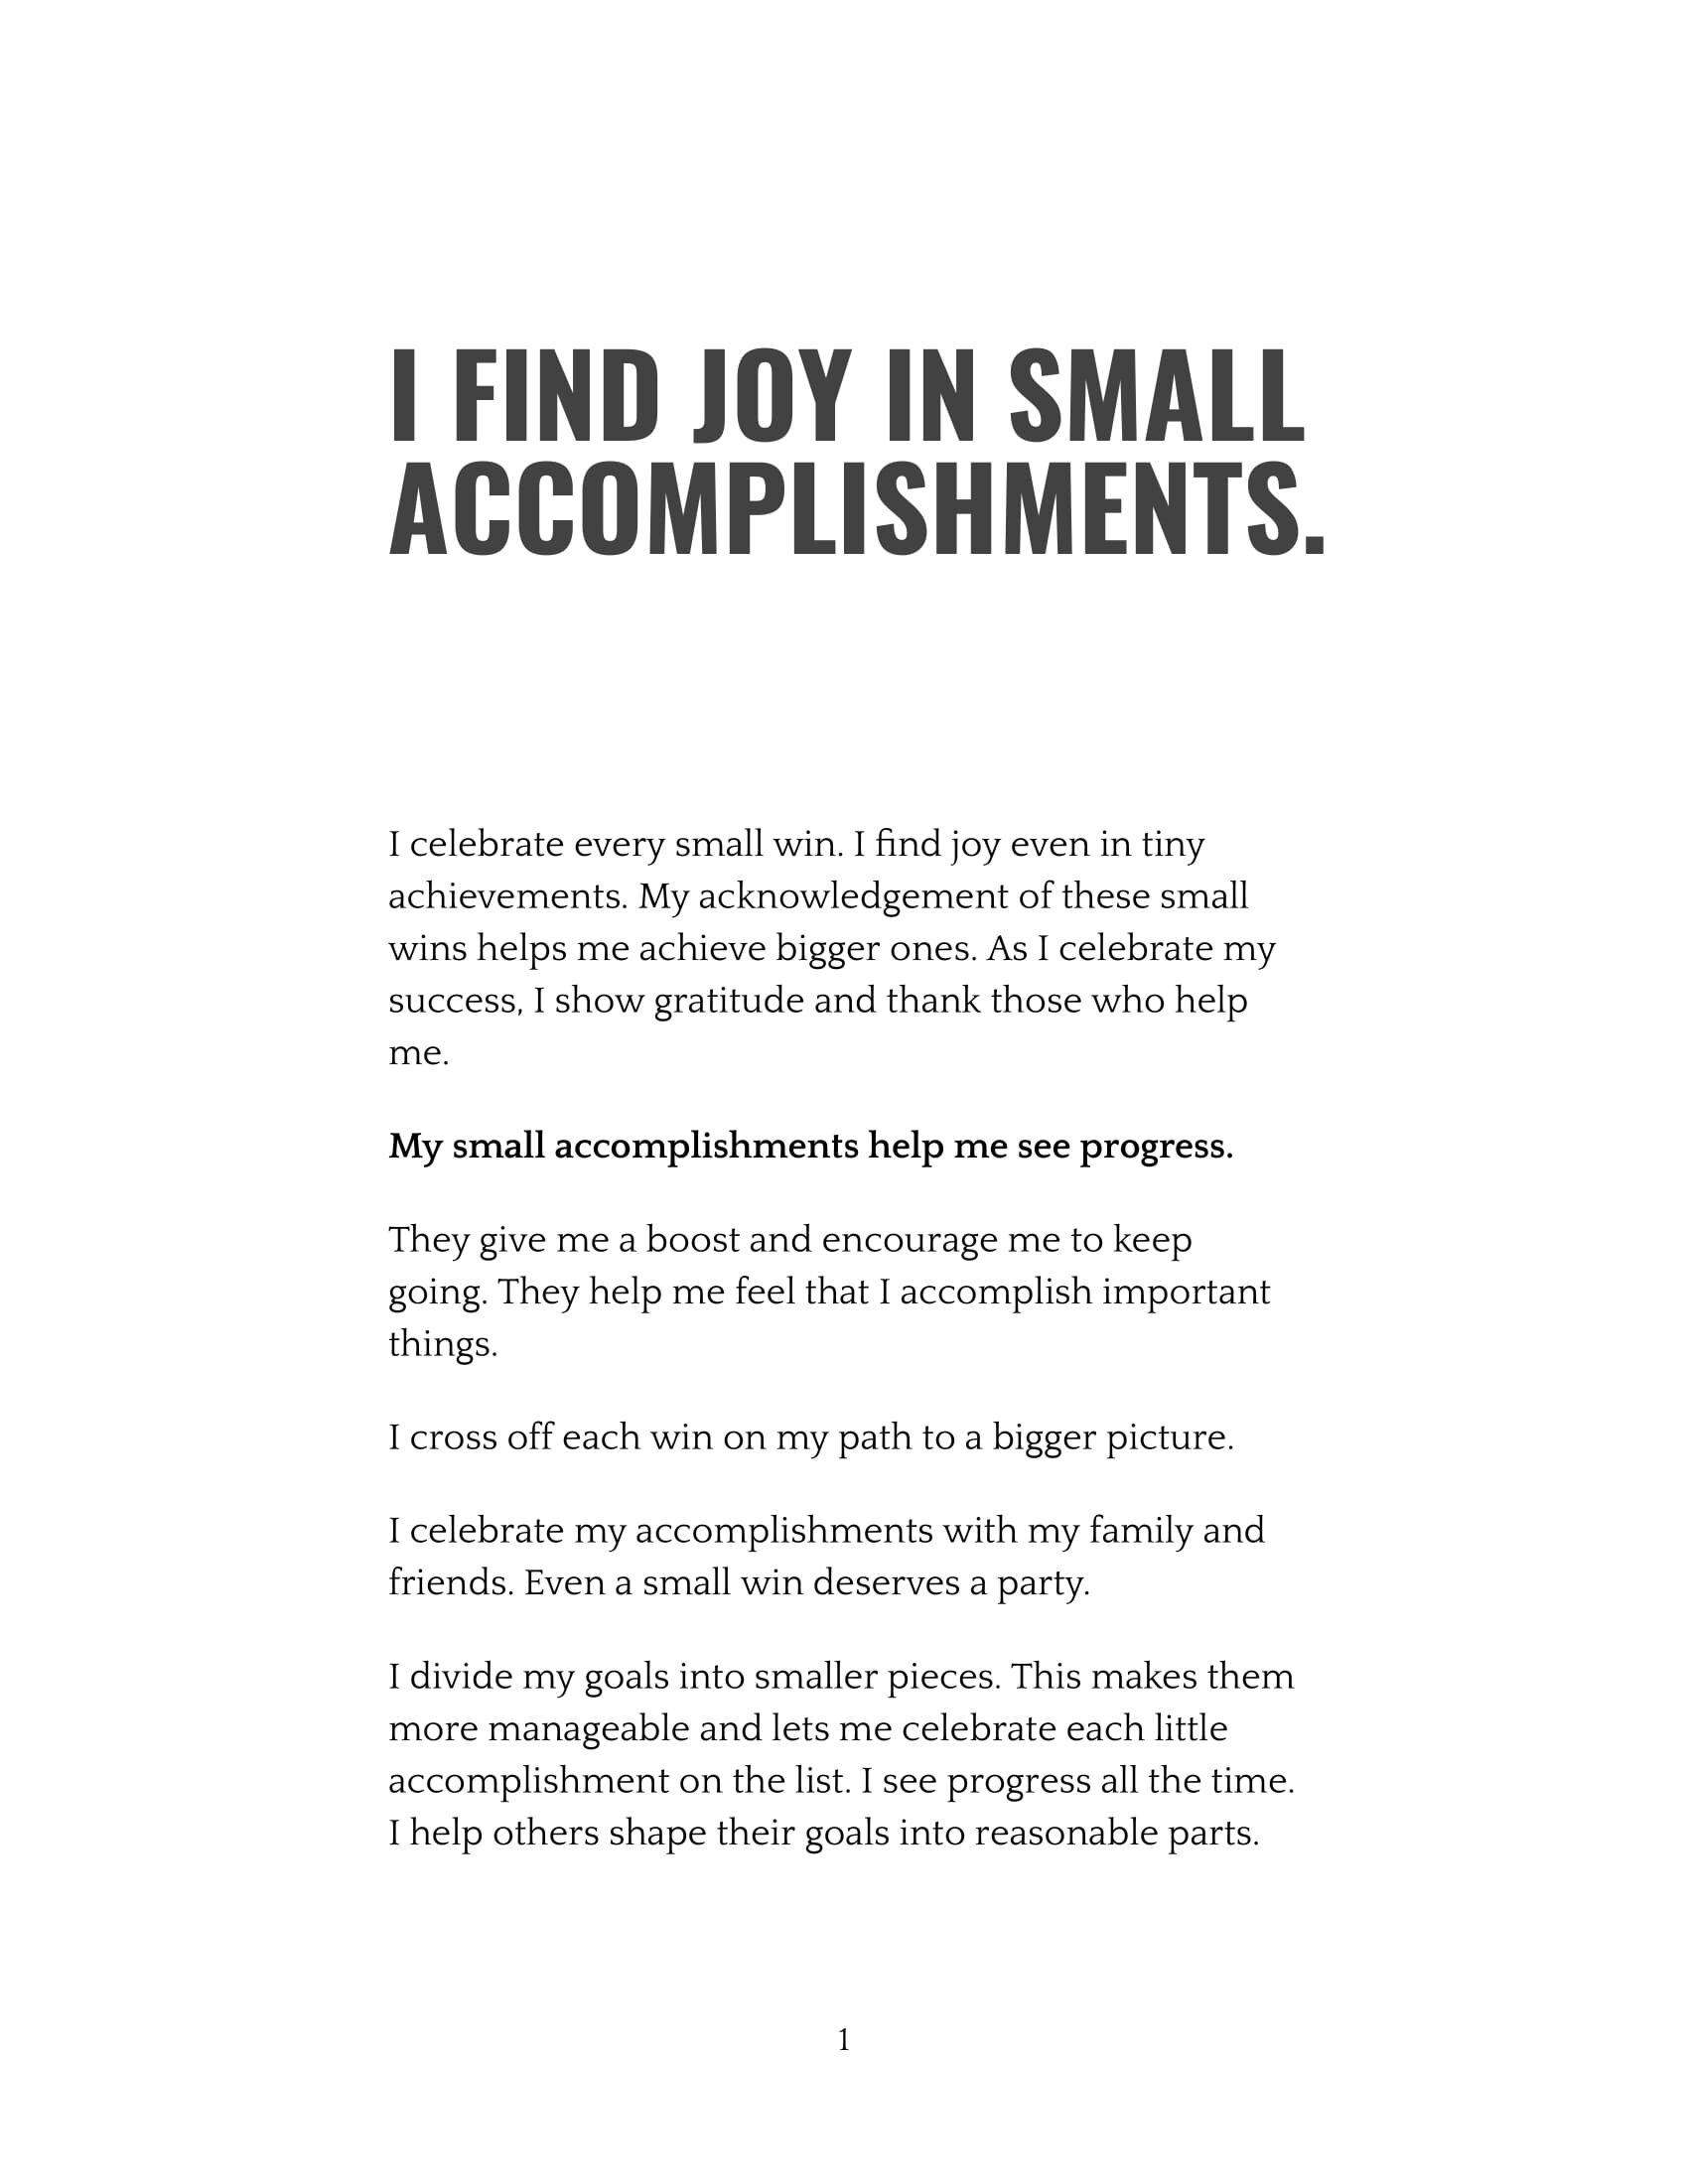 I Find Joy In Small Accomplishments-1.jpg